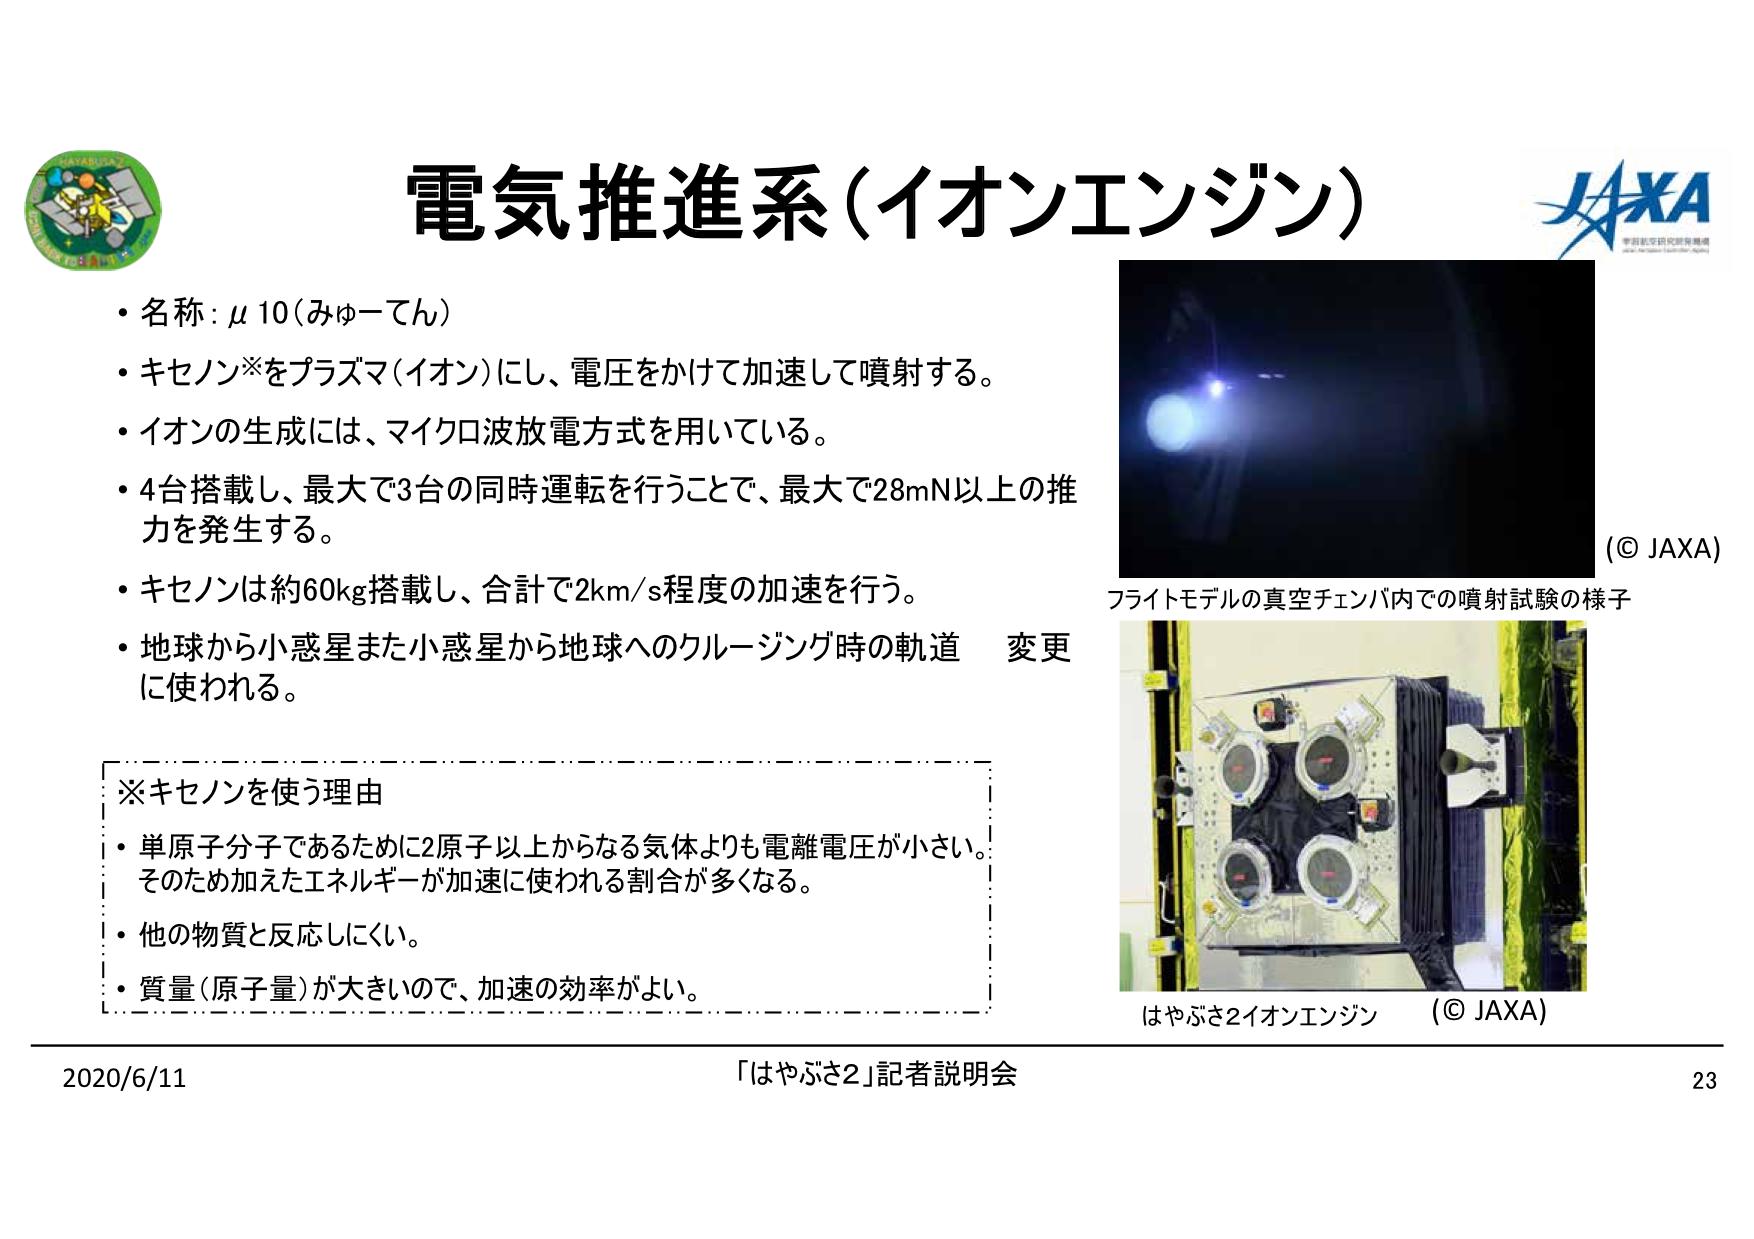 f:id:Imamura:20200611094707p:plain